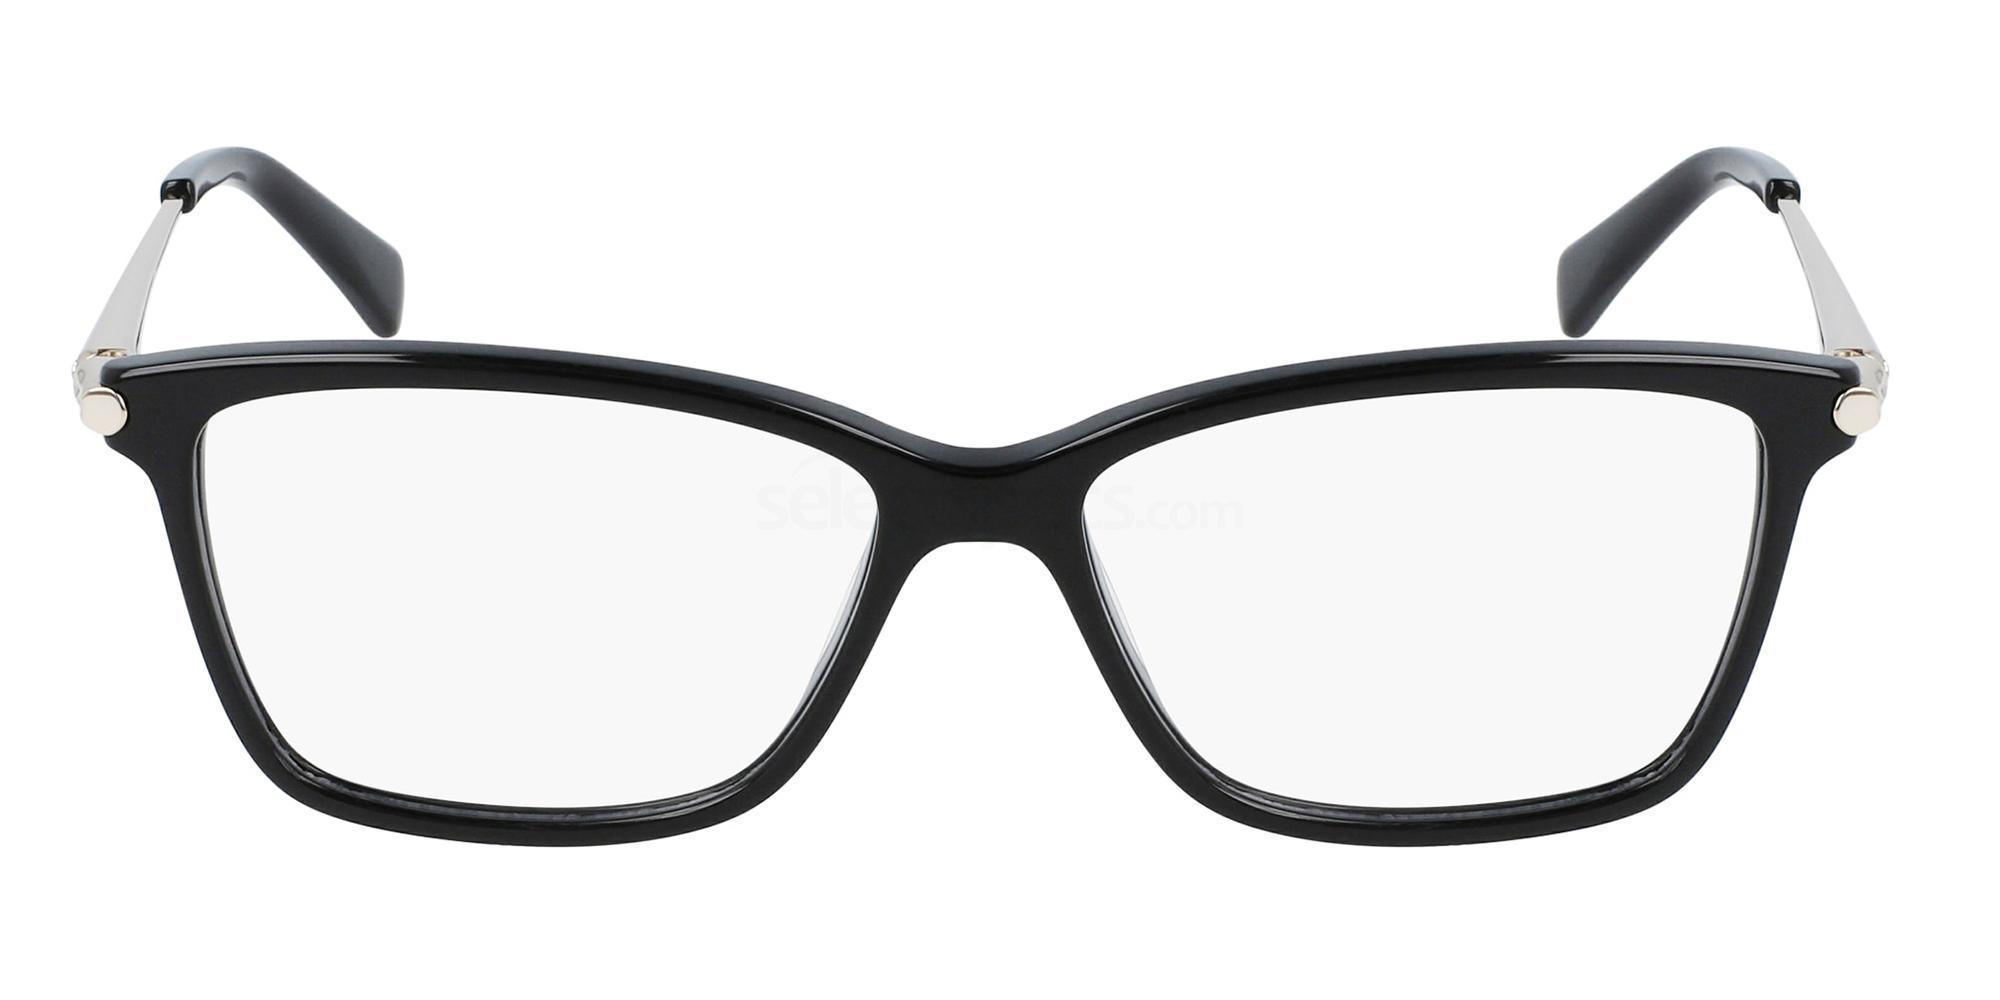 001 LO2621 Glasses, LONGCHAMP